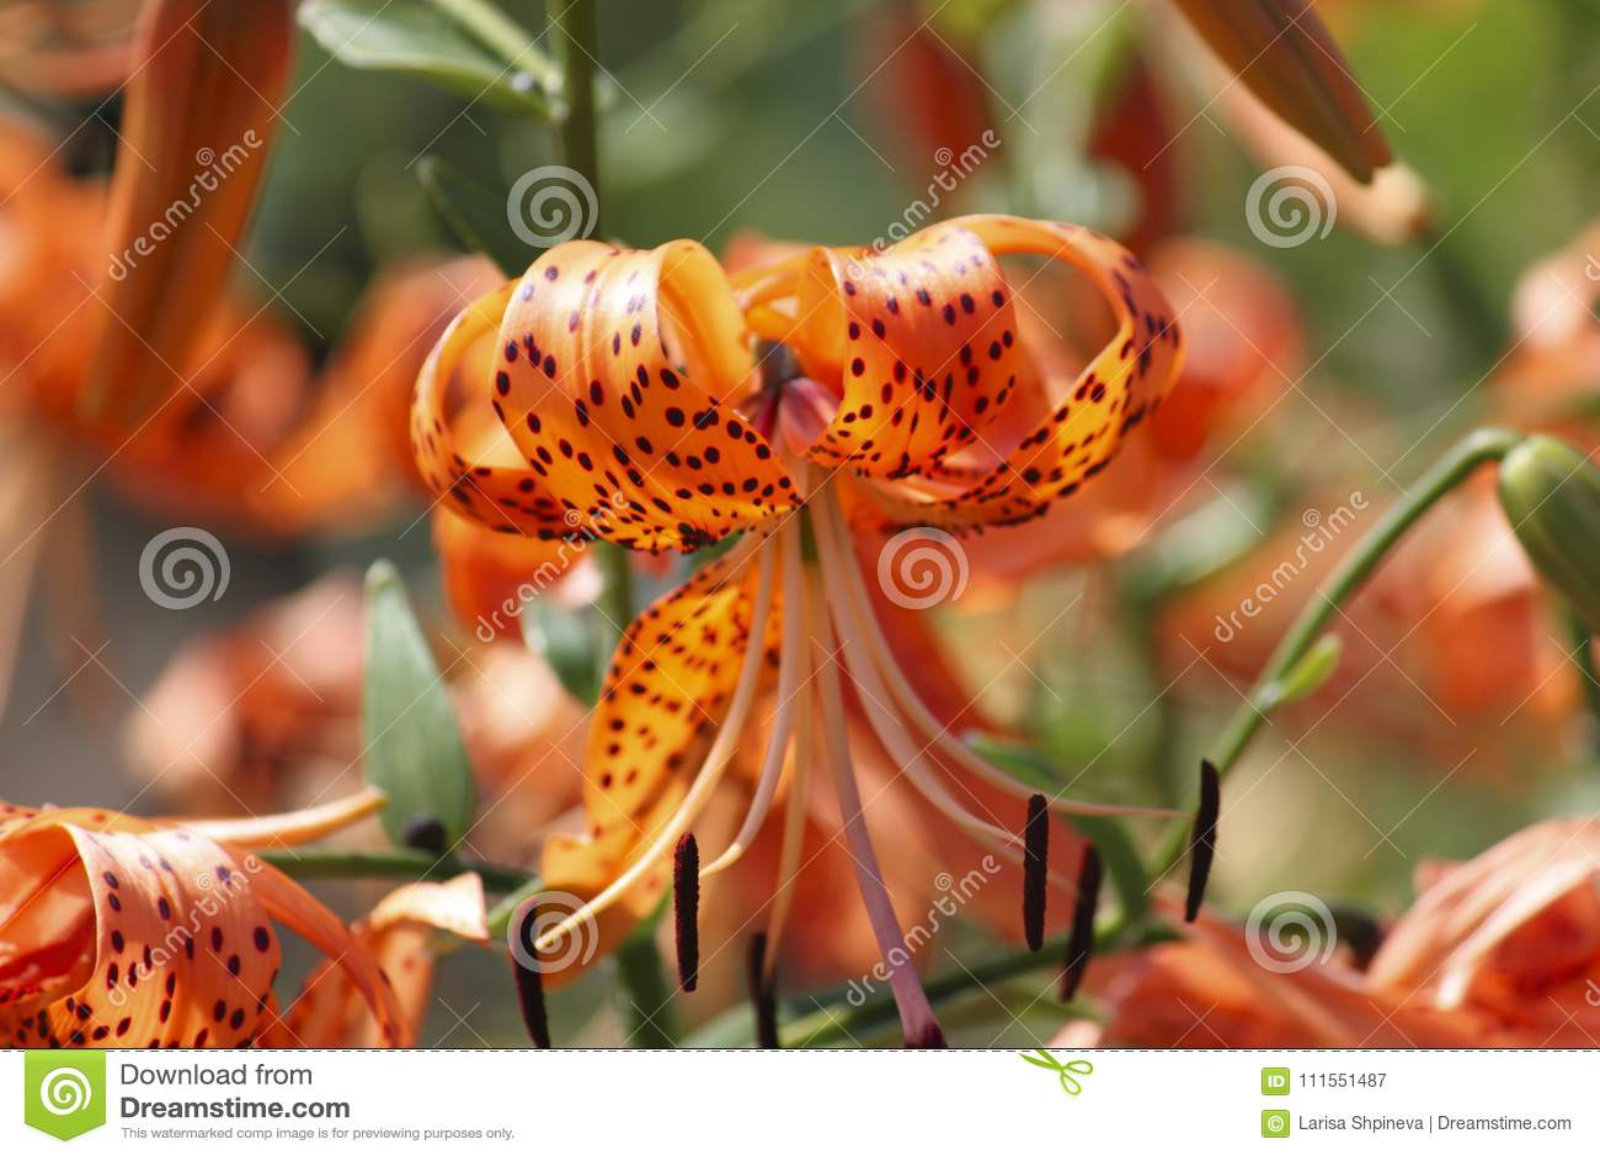 Flowers of orange tiger lilies lilium in garden on blurred flowers of orange tiger lilies lilium in garden on blurred background izmirmasajfo